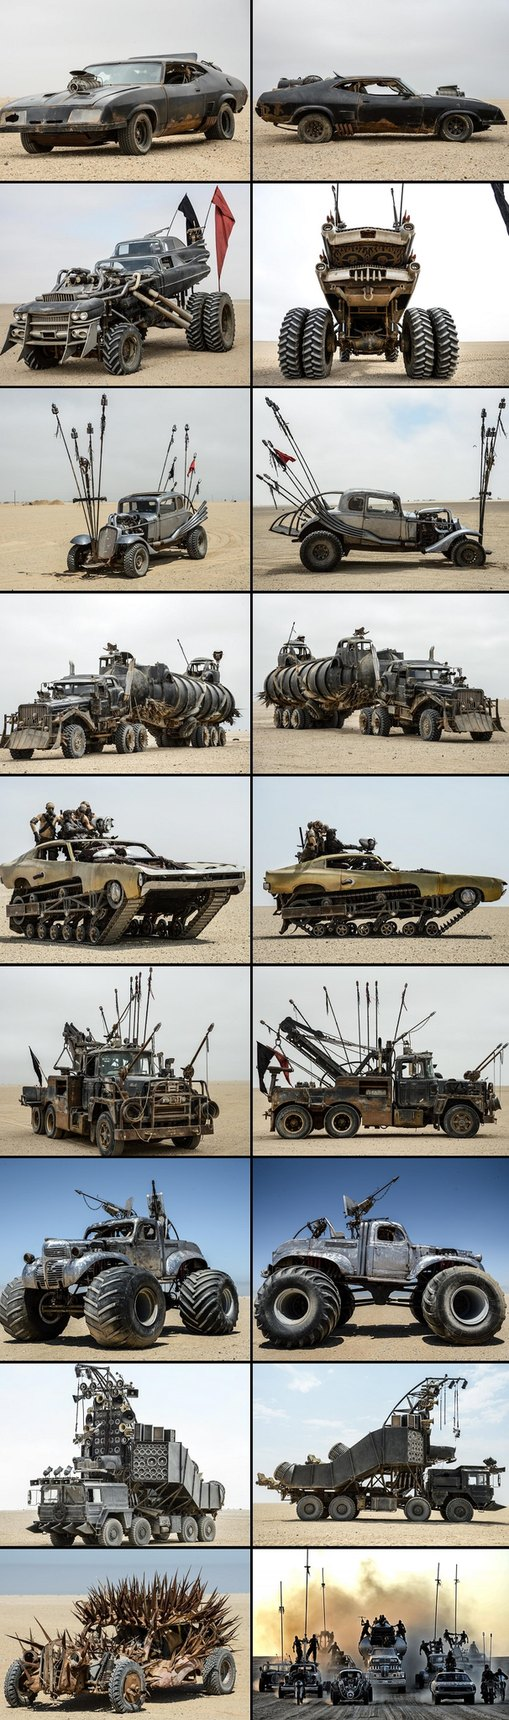 Cars of Mad Max: Fury Road - meme